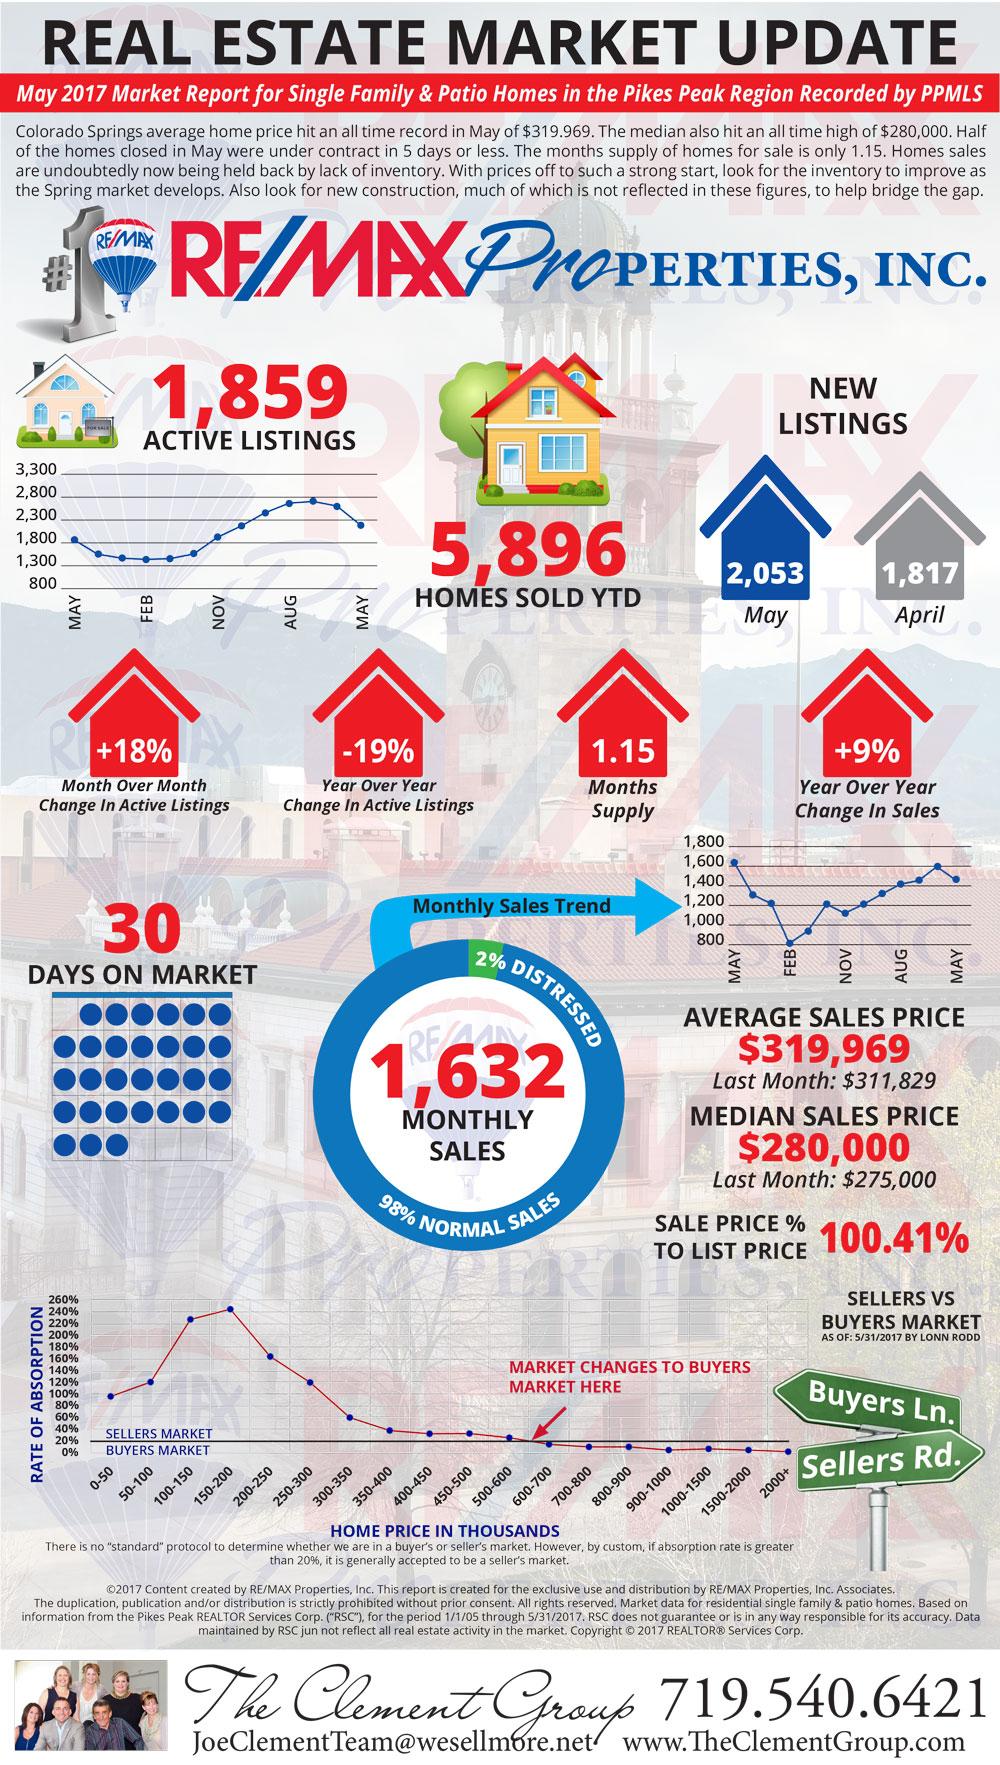 May 2017 Market Update - Colorado Springs Real Estate